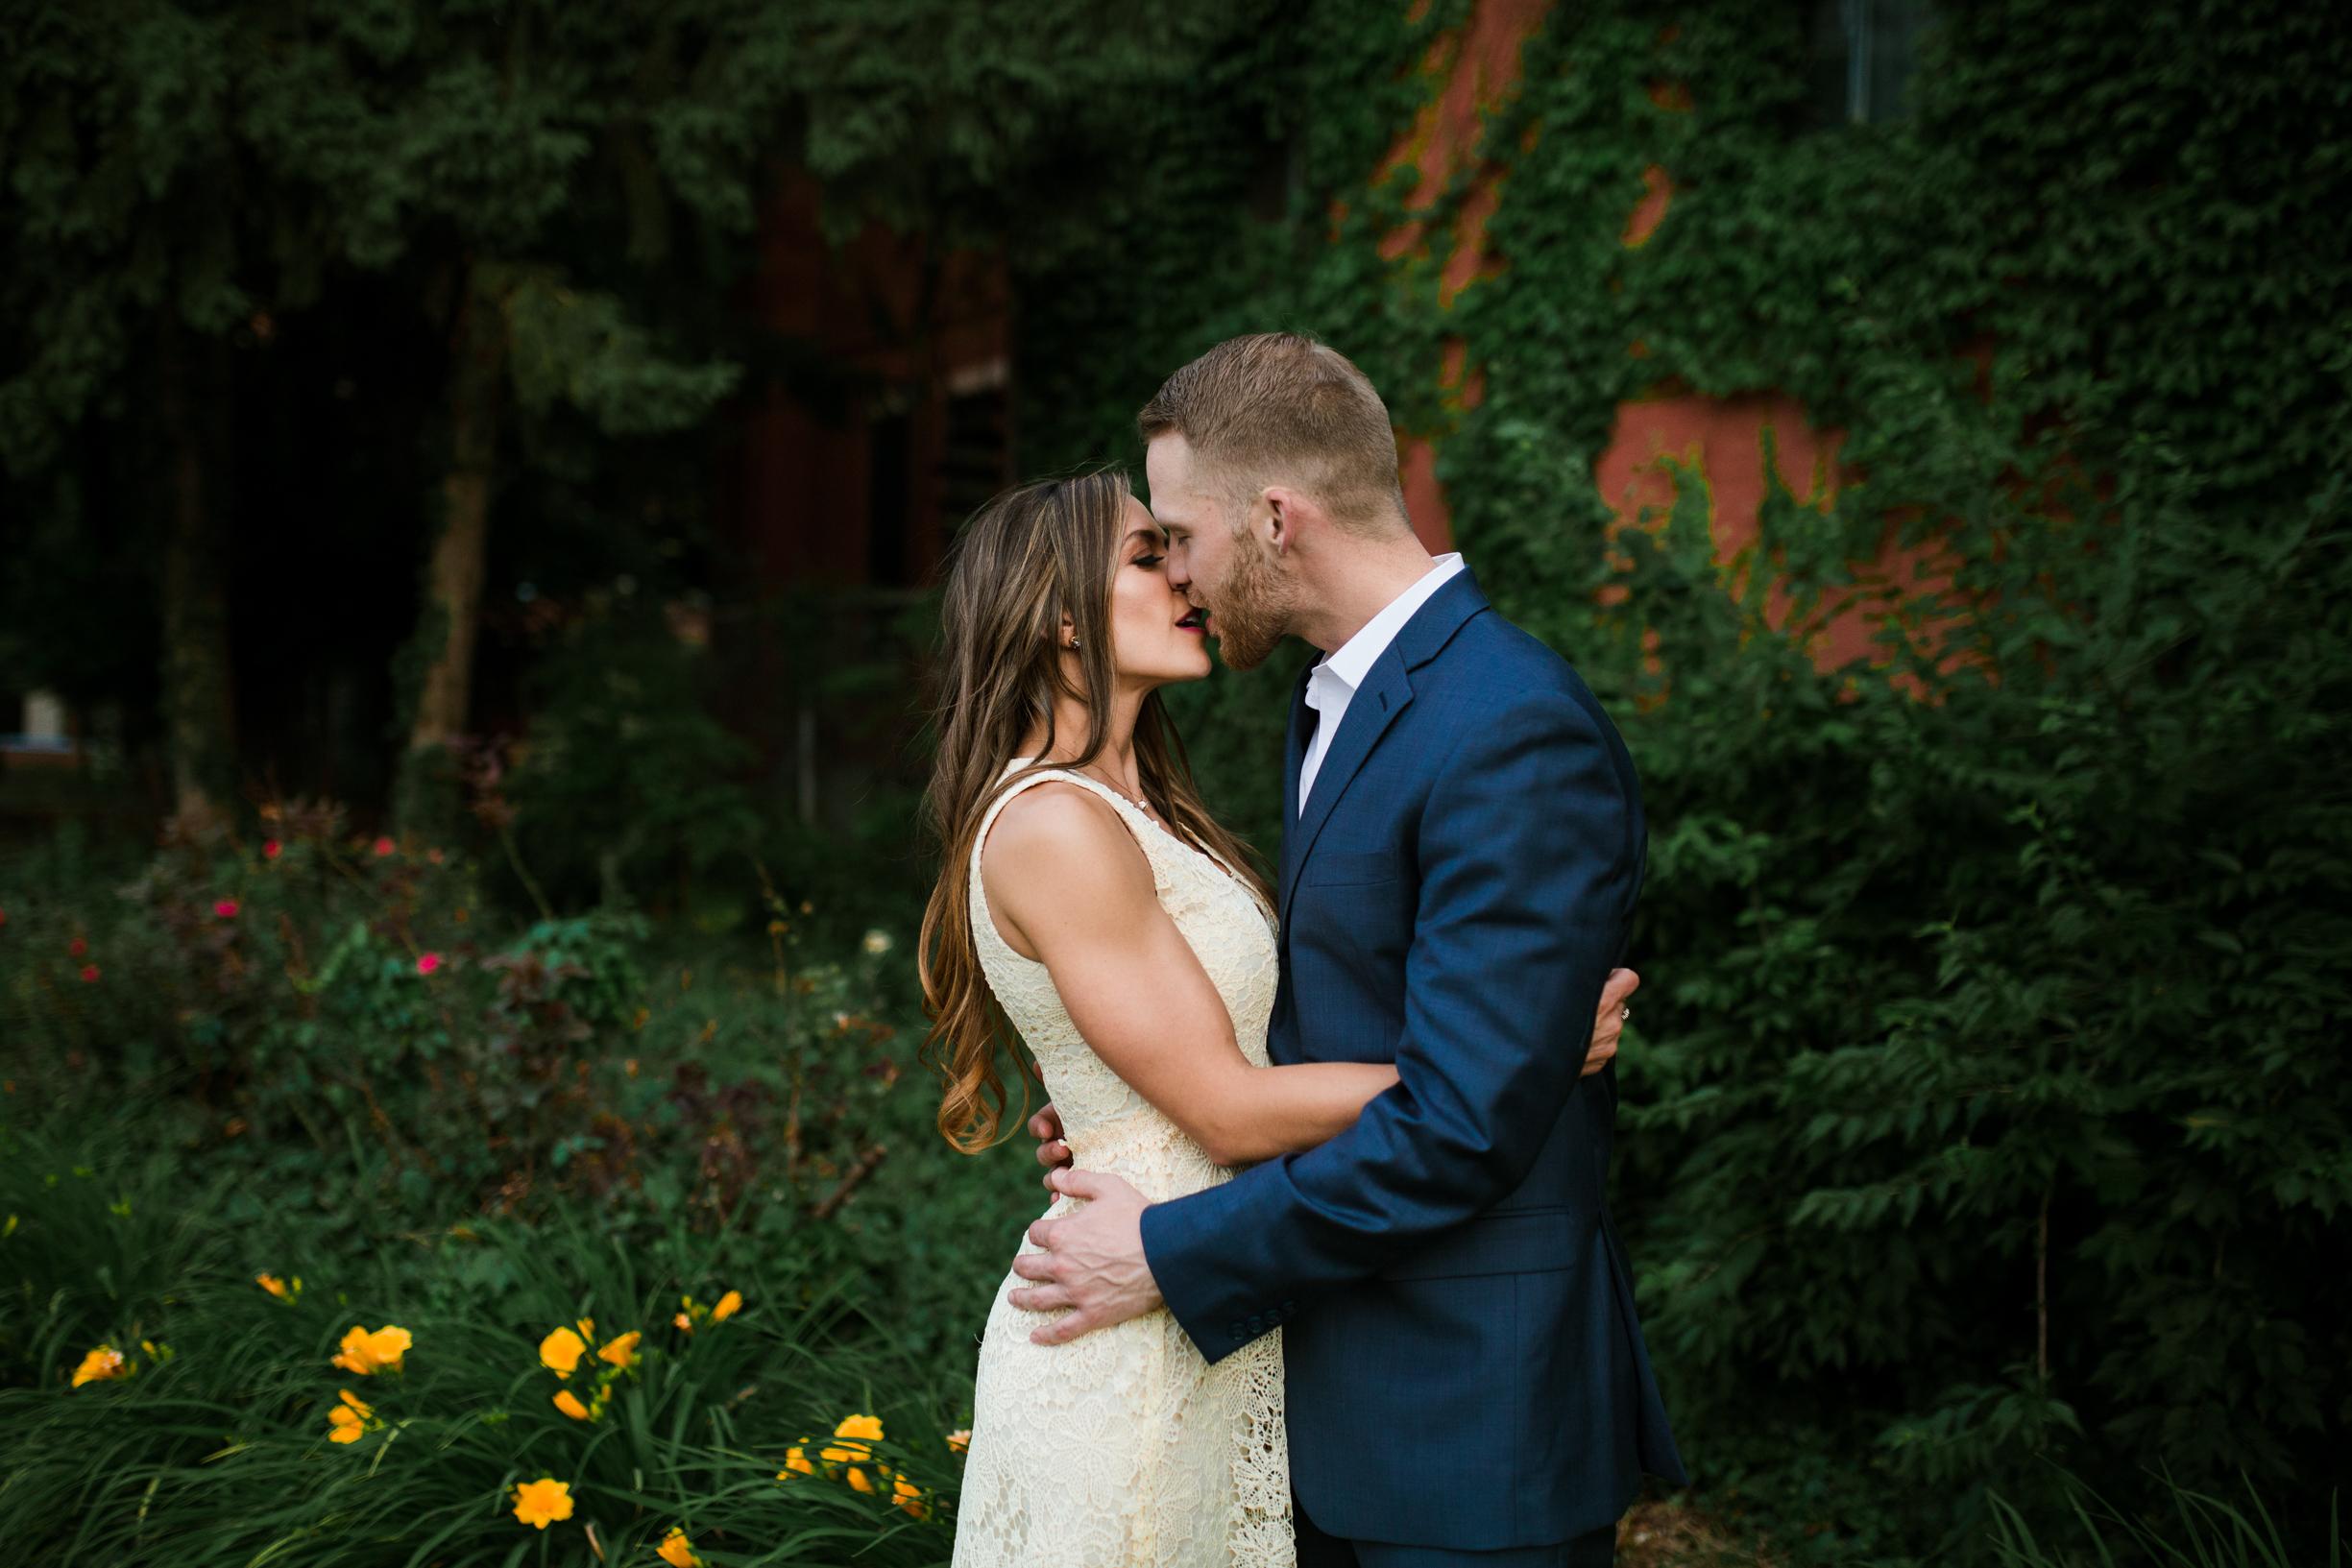 Victoria & Chad Engagement 2018 Crystal Ludwick Photo Louisville Kentucky Wedding Photographer WEBSITE (22 of 48).jpg